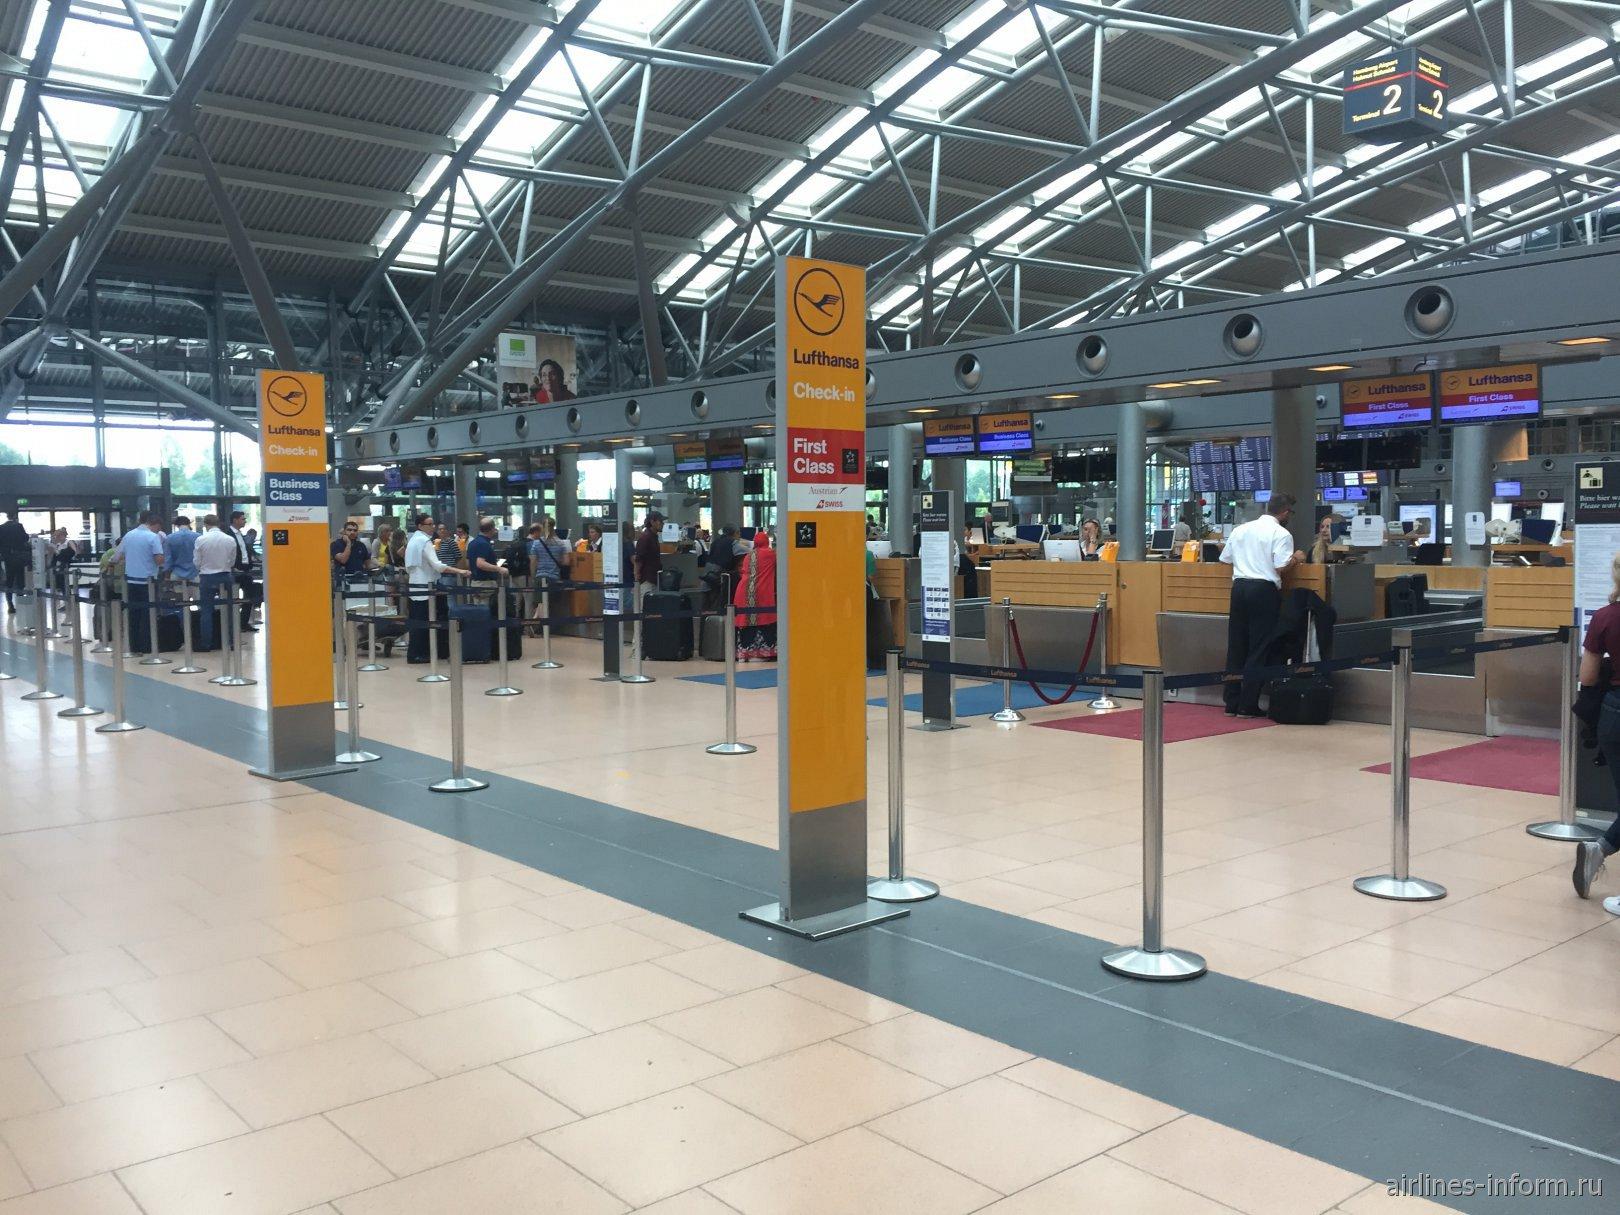 Стойки регистрации авиакомпании Lufthansa в аэропорту Гамбург